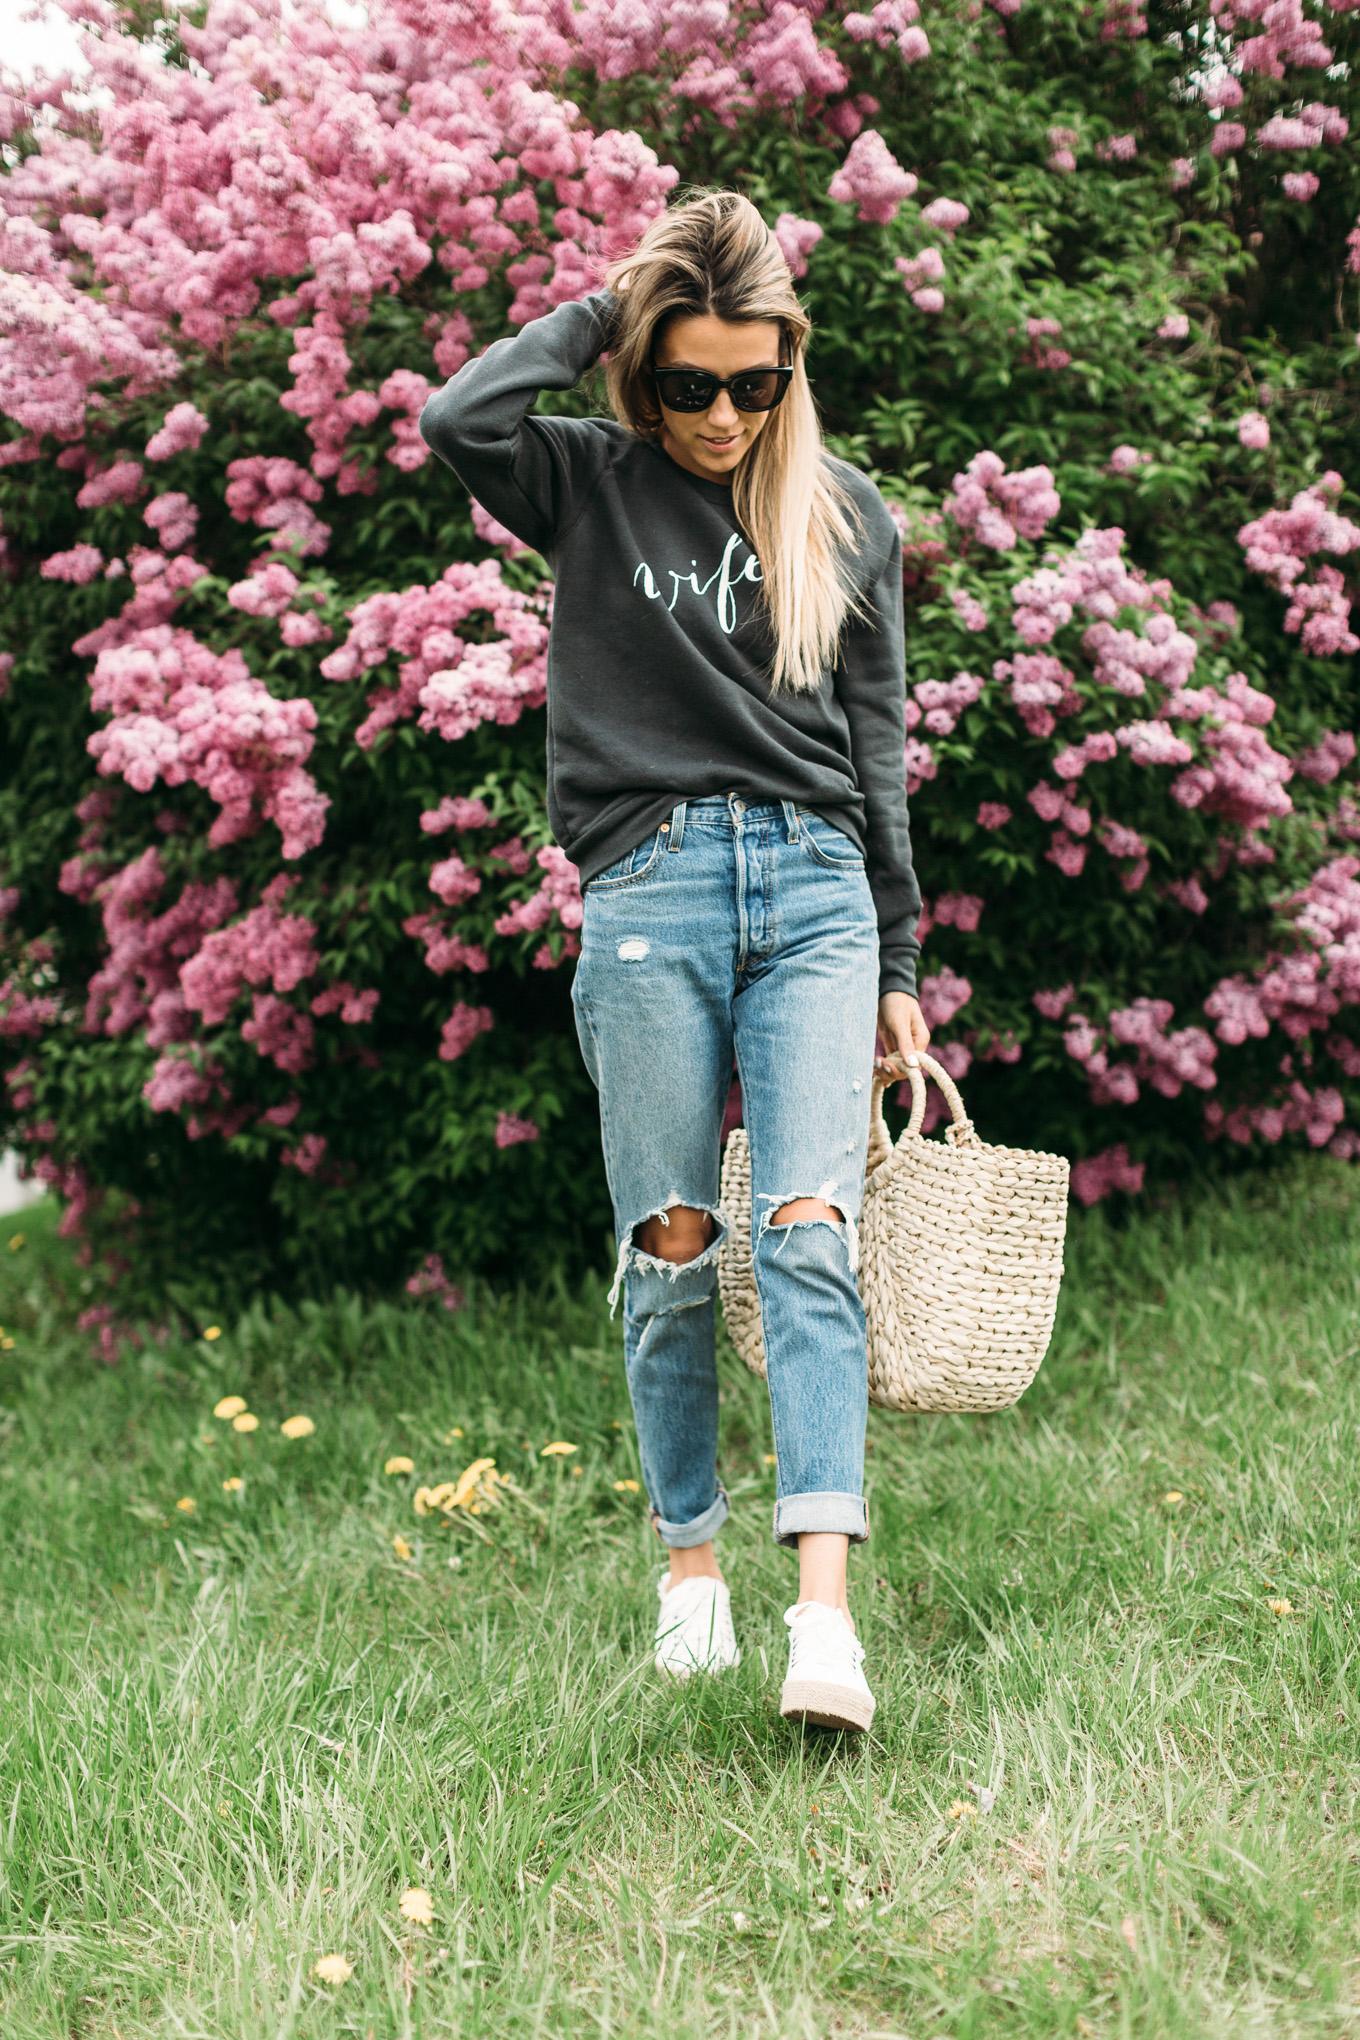 ily couture wifey sweatshirt